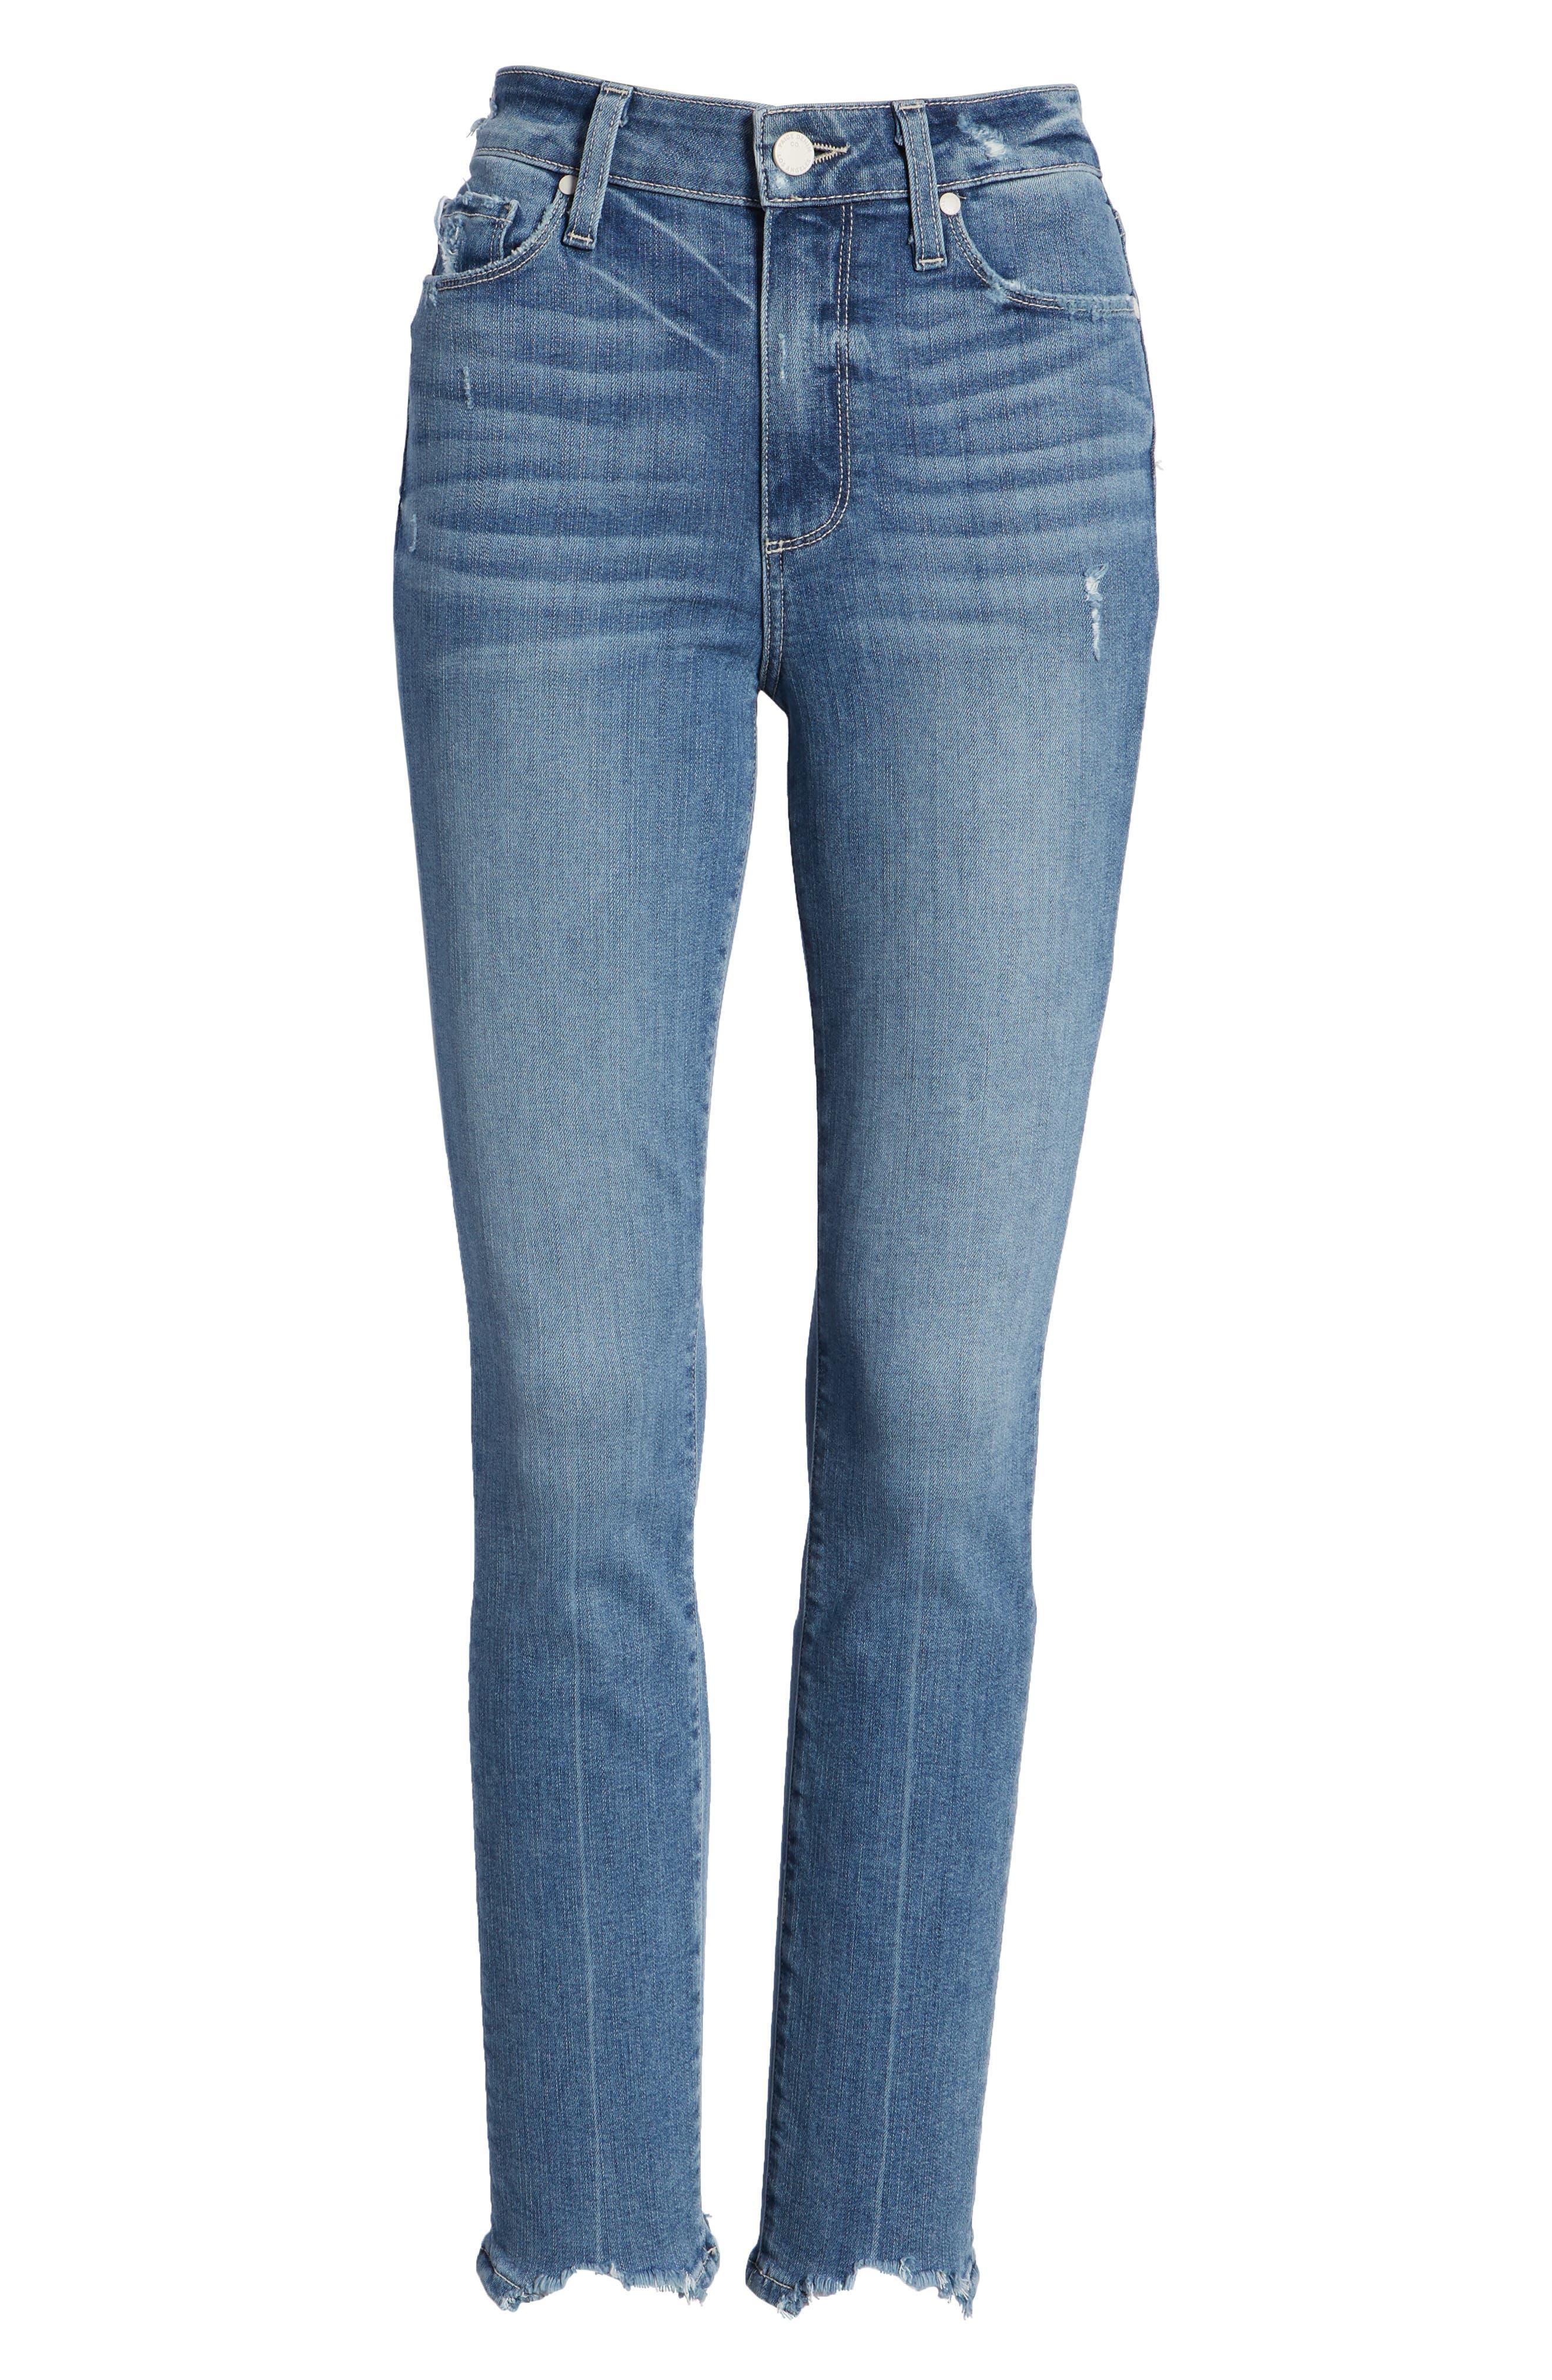 Transcend Vintage - Hoxton High Waist Ankle Skinny Jeans,                             Alternate thumbnail 7, color,                             ZAHARA